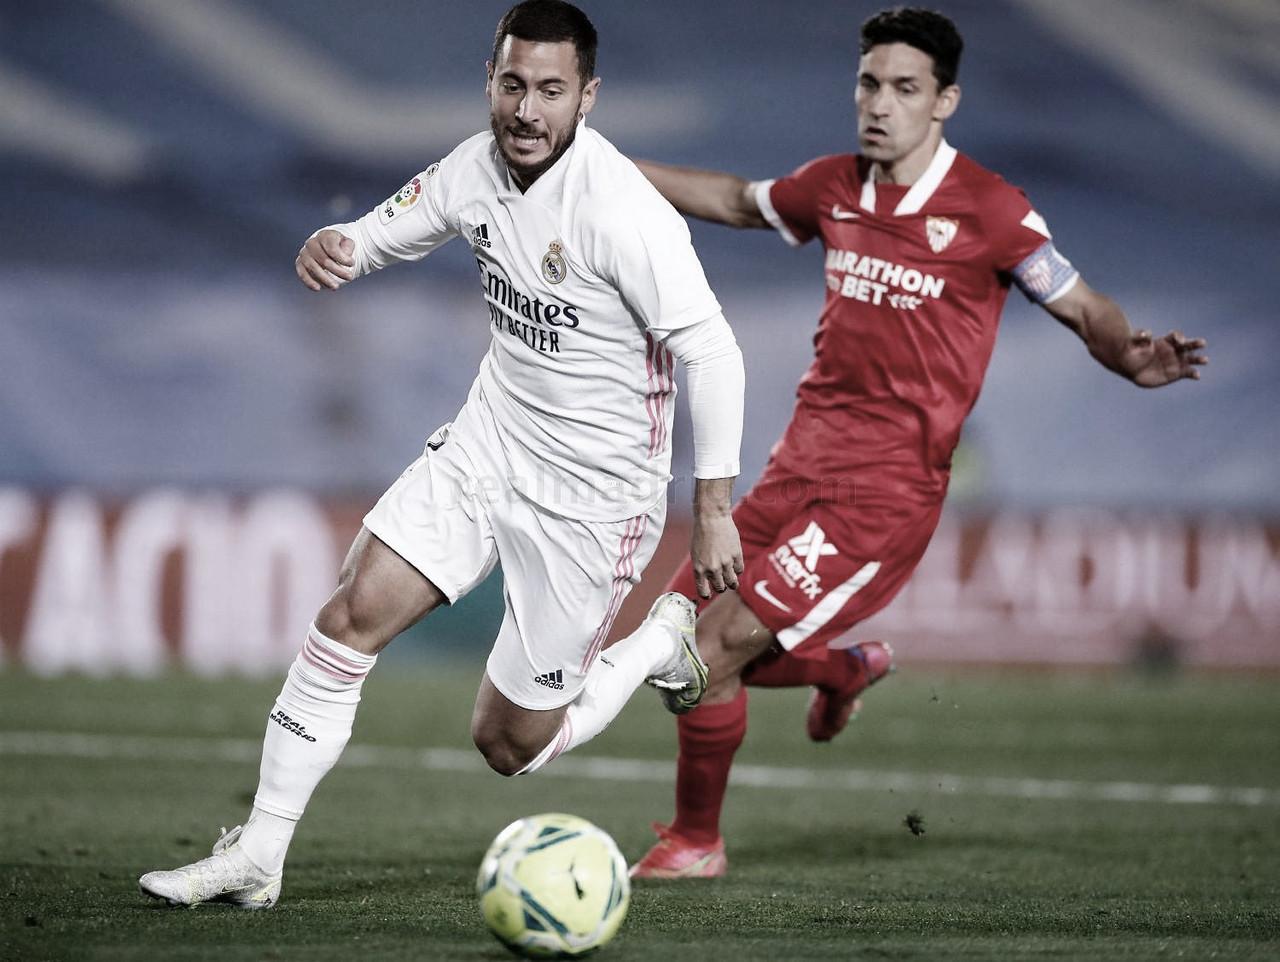 Com VAR protagonista, Hazard empata para o Real Madrid nos acrésicmos contra o Sevilla